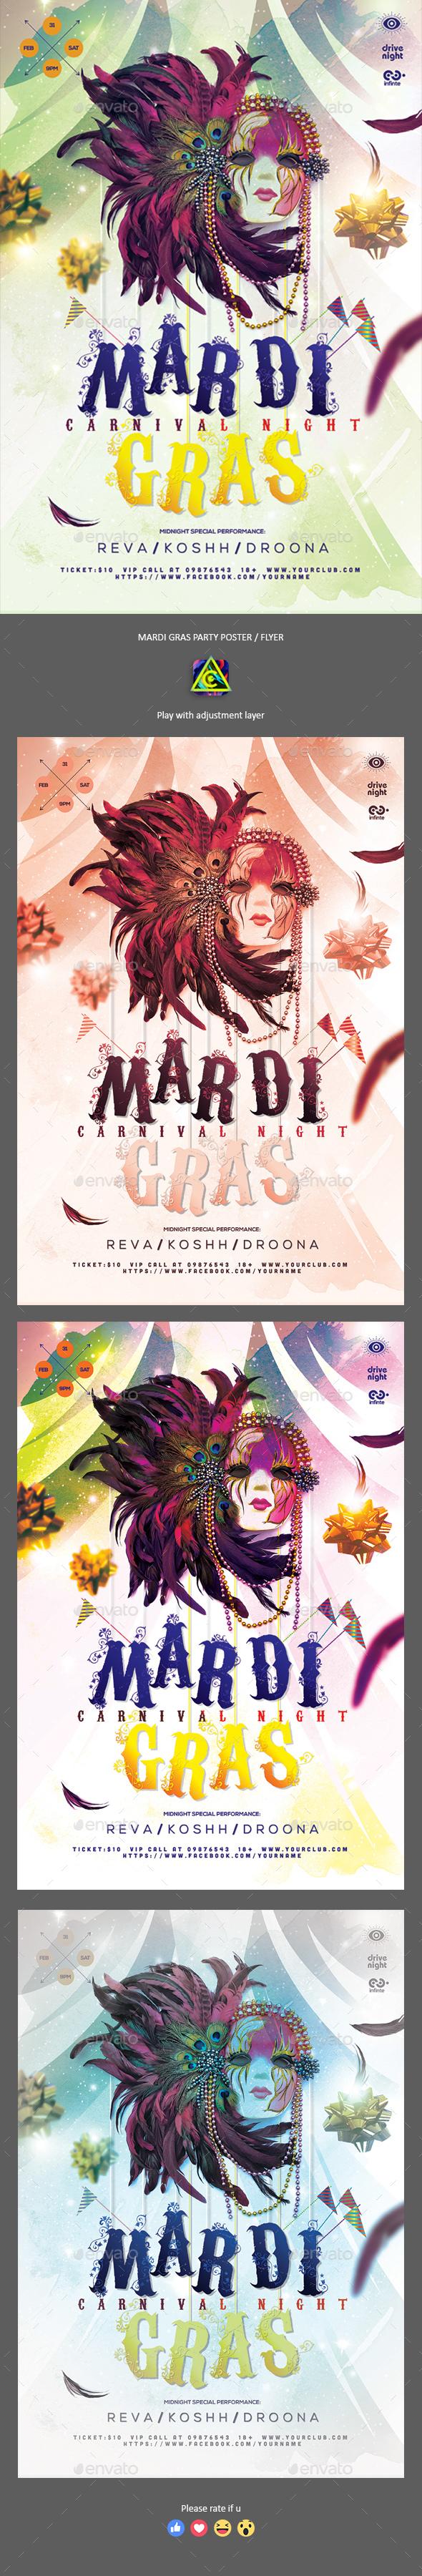 Mardi Gras Poster / Flyer - Events Flyers